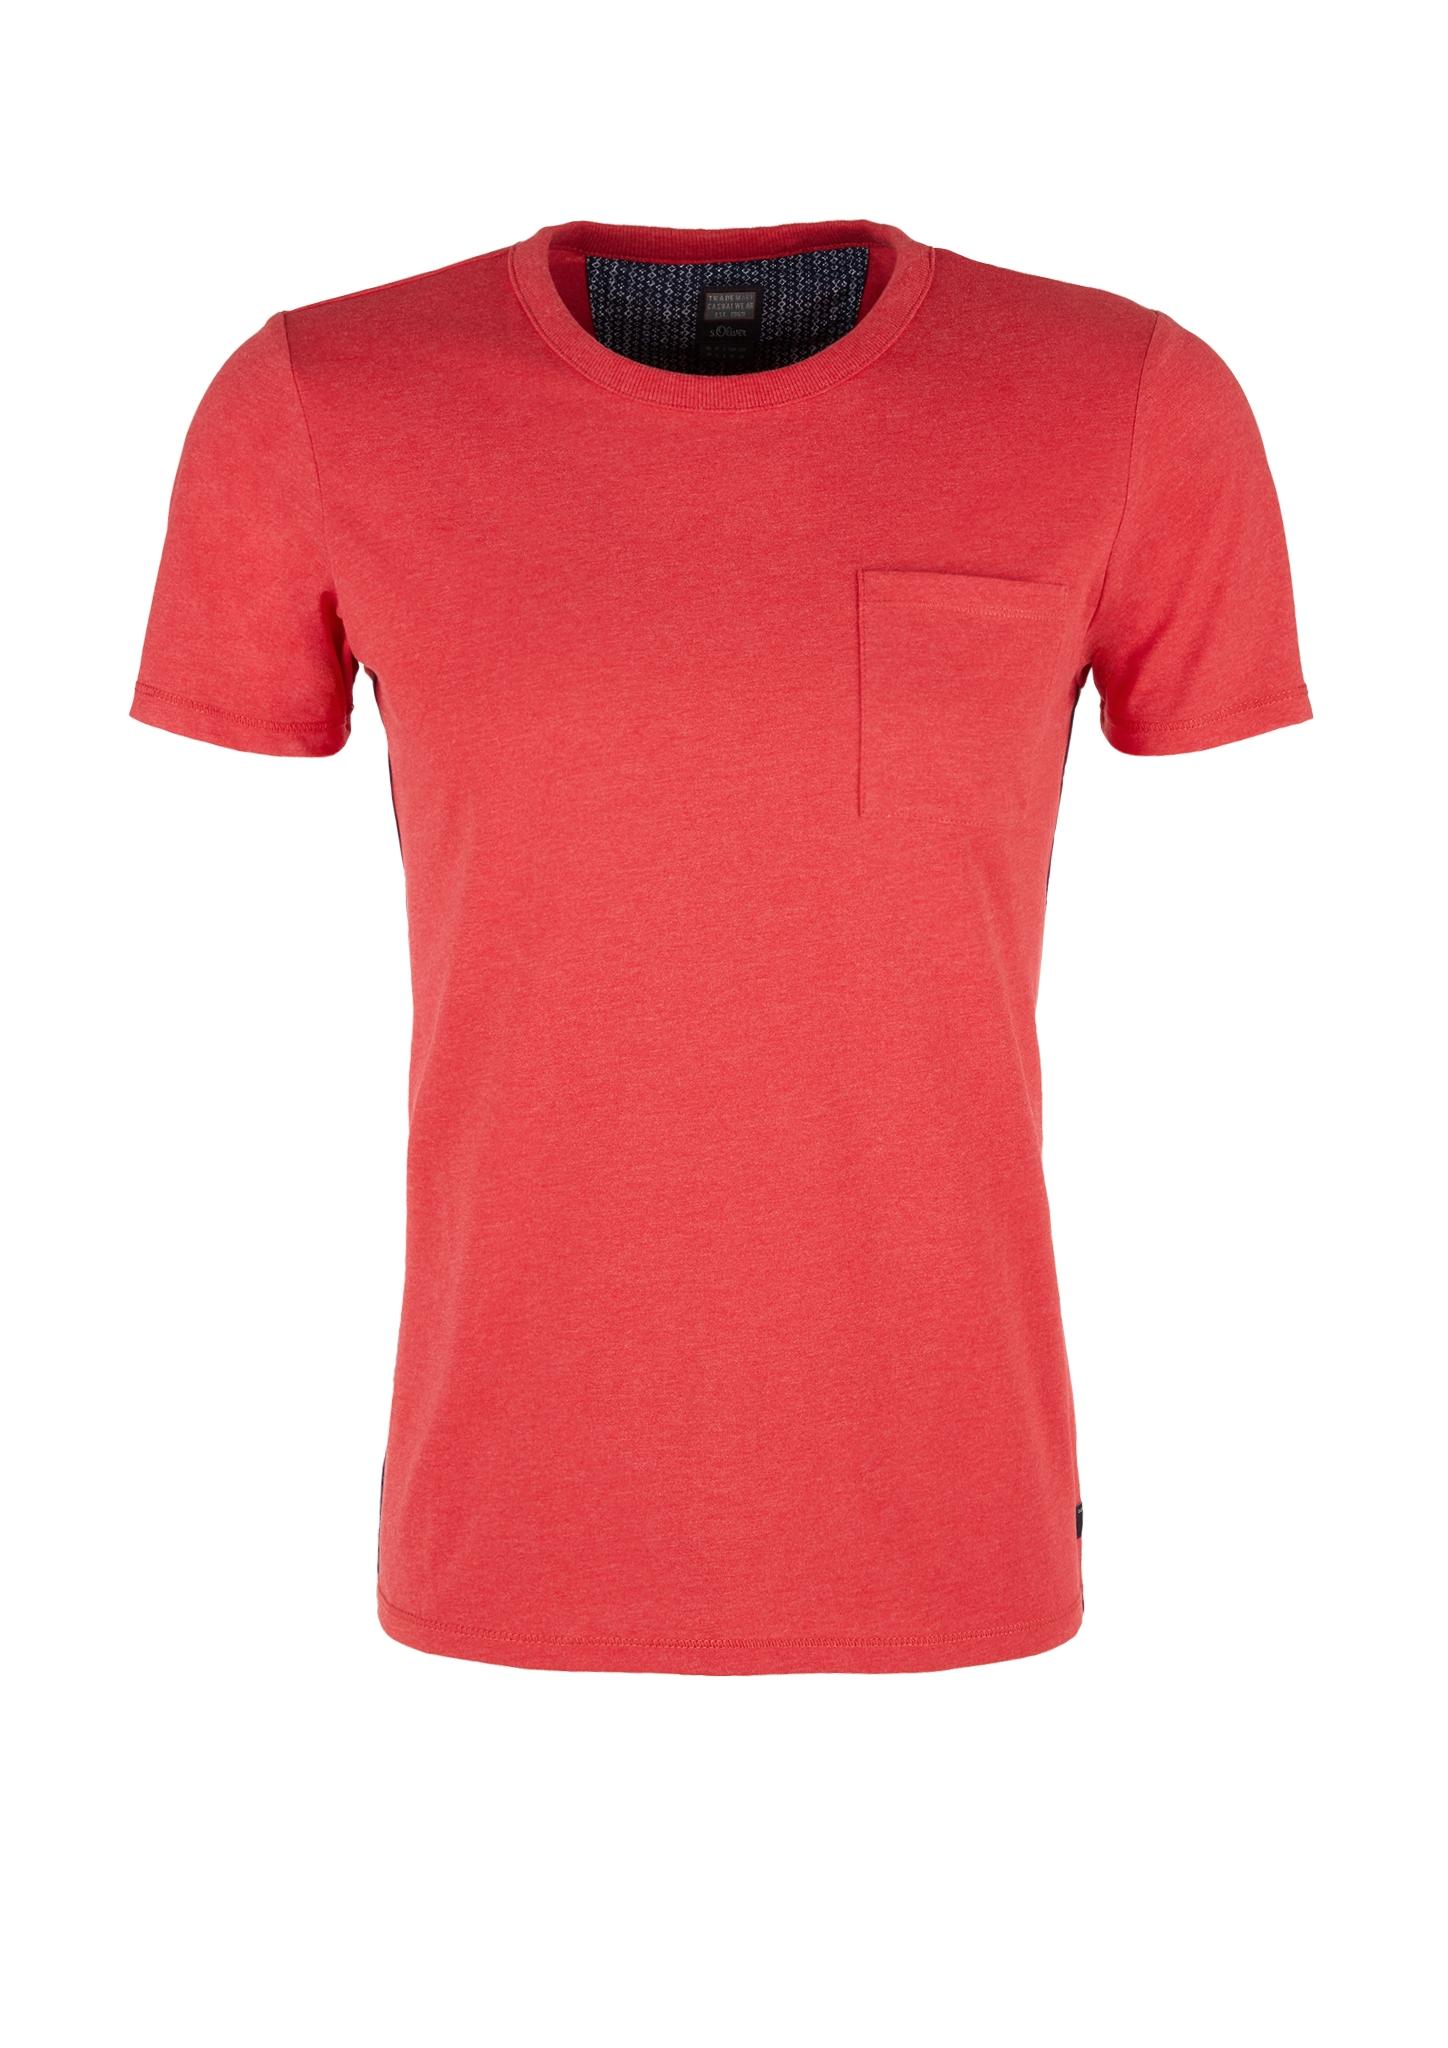 Melange-Shirt | Bekleidung > Shirts > Sonstige Shirts | Rot | 60% baumwolle -  40% polyester | s.Oliver